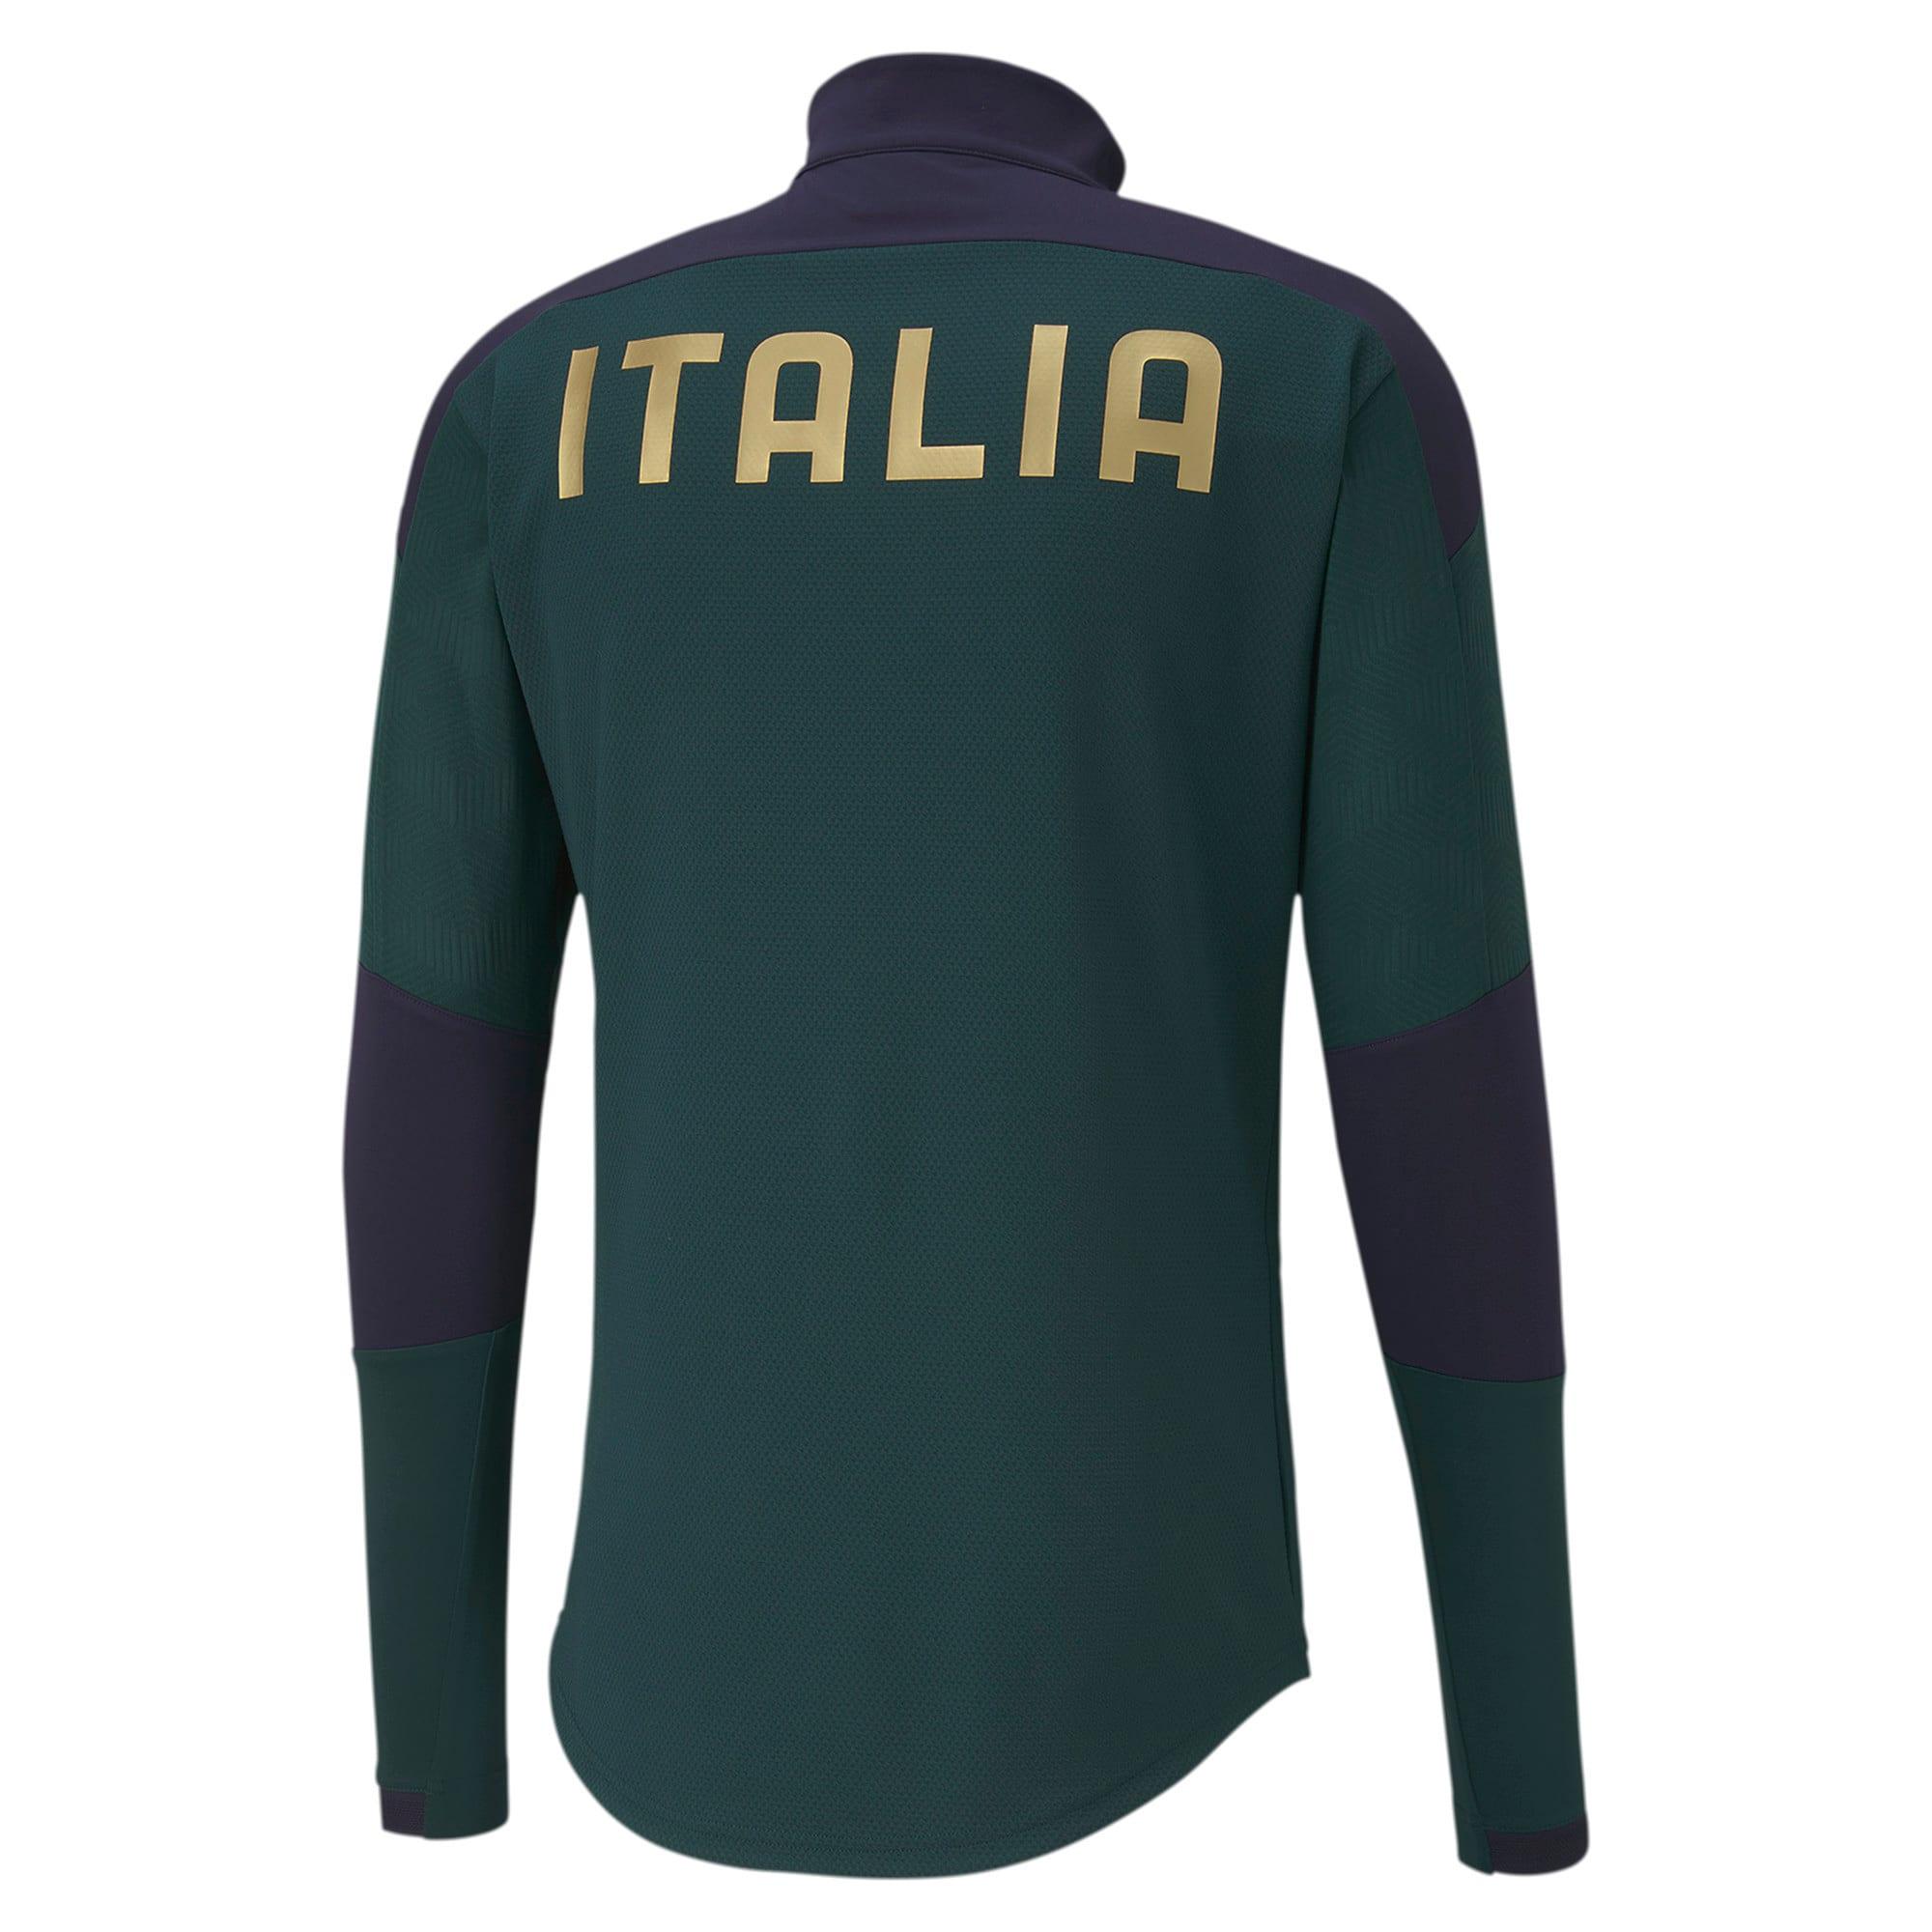 Thumbnail 3 of FIGC イタリア トレーニング 1/4 ジップトップ, Ponderosa Pine-Peacoat, medium-JPN